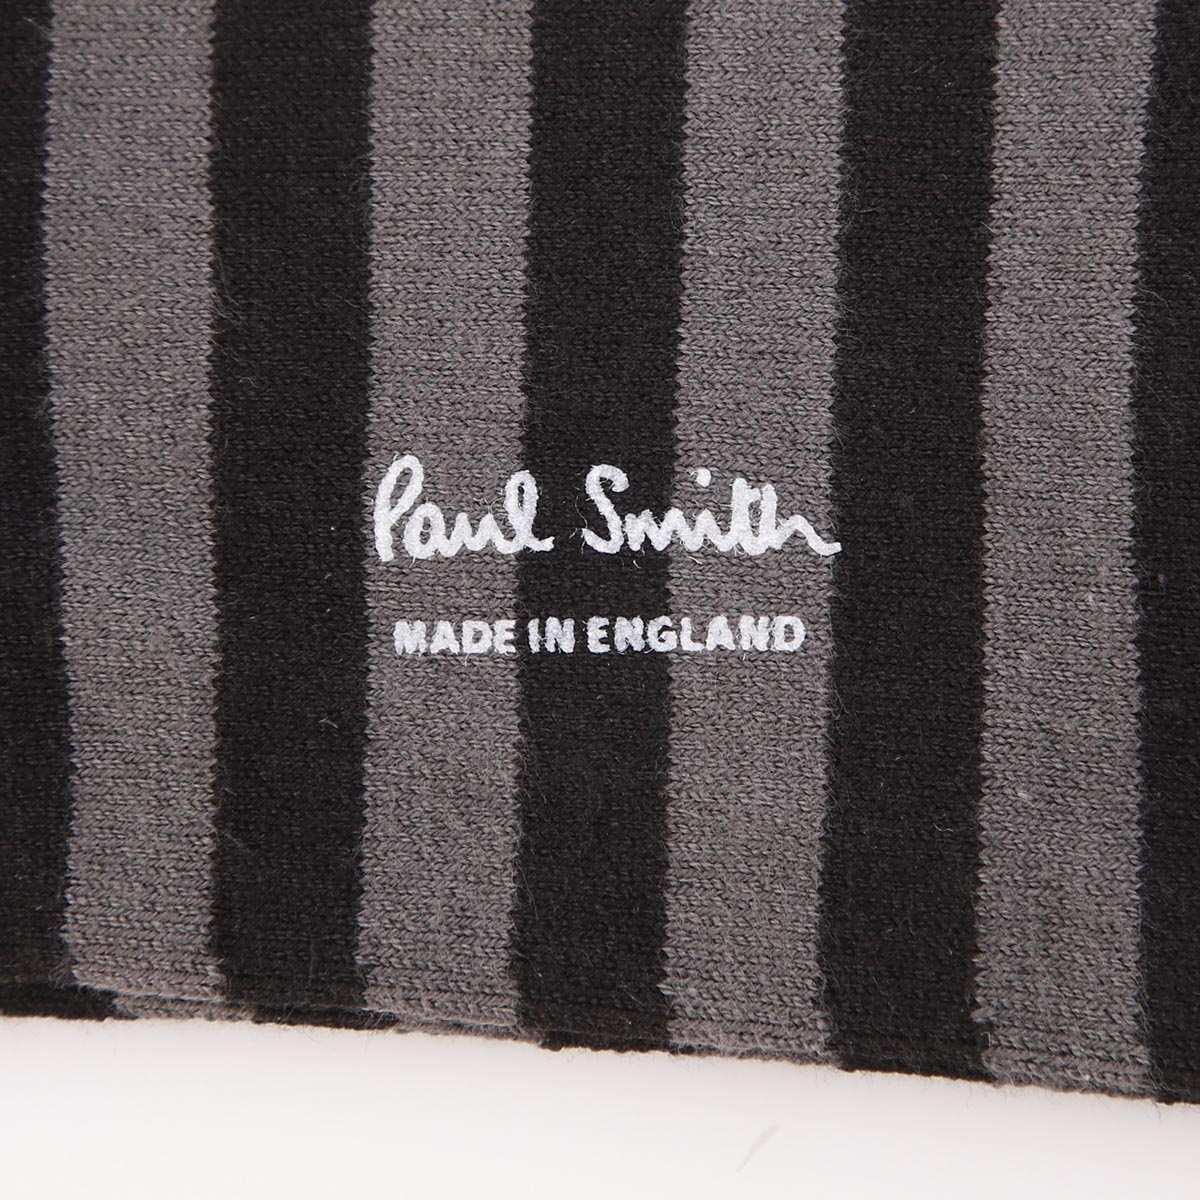 Paul Smith ポールスミス ソックス 3足セット/靴下/SOCK PACK MIXED【返品交換不可】 メンズ